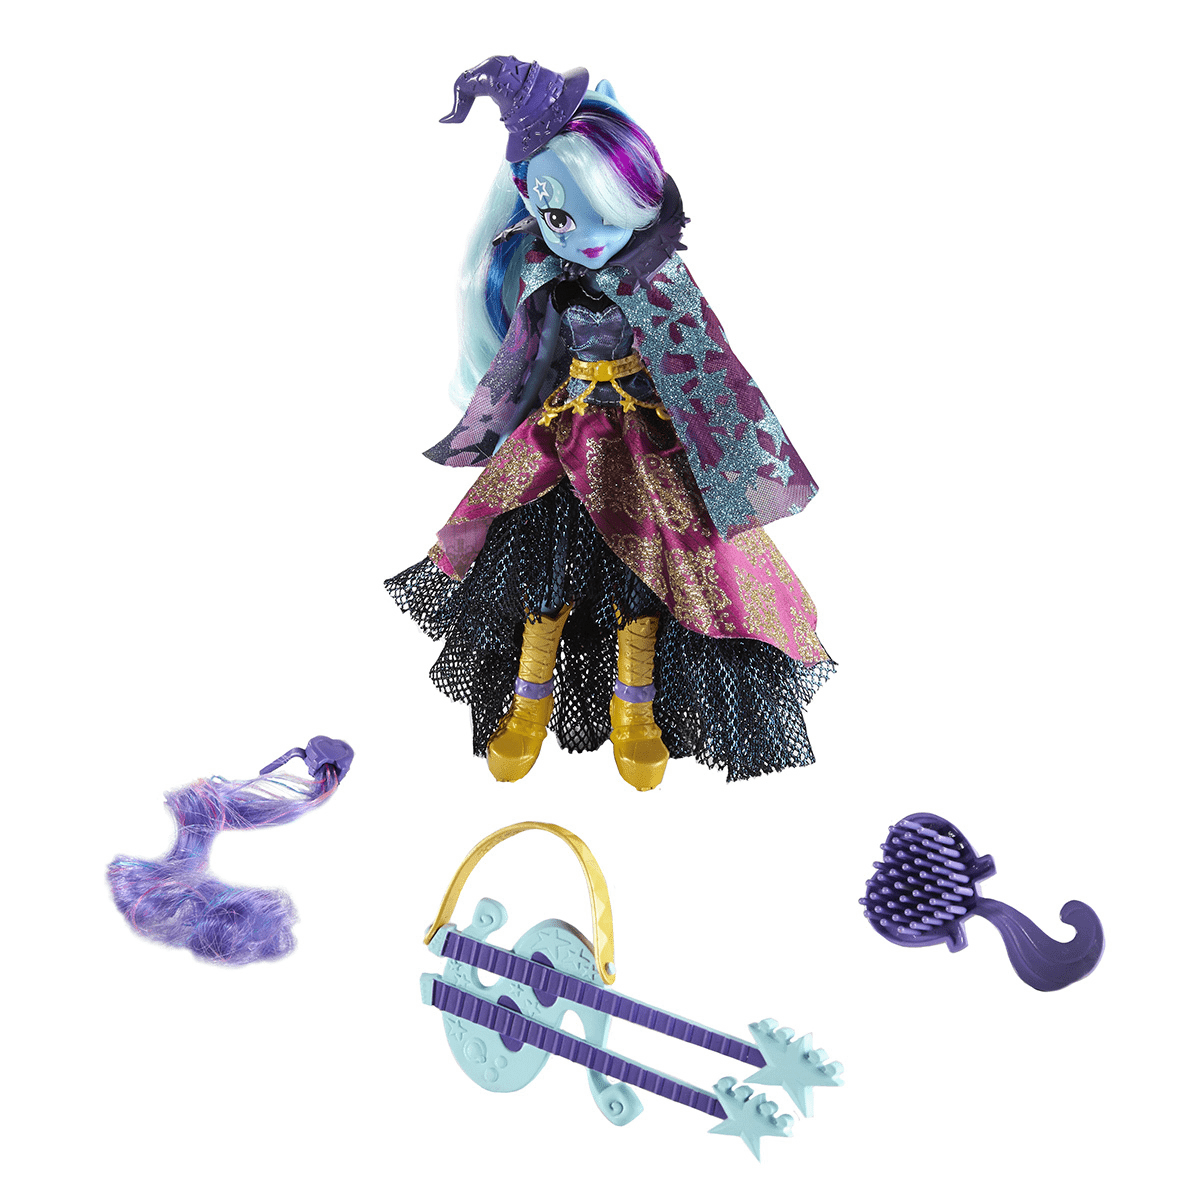 BONECA MY LITTLE PONY -  EQUESTRIA GIRLS - TRIXIE LULAMOON